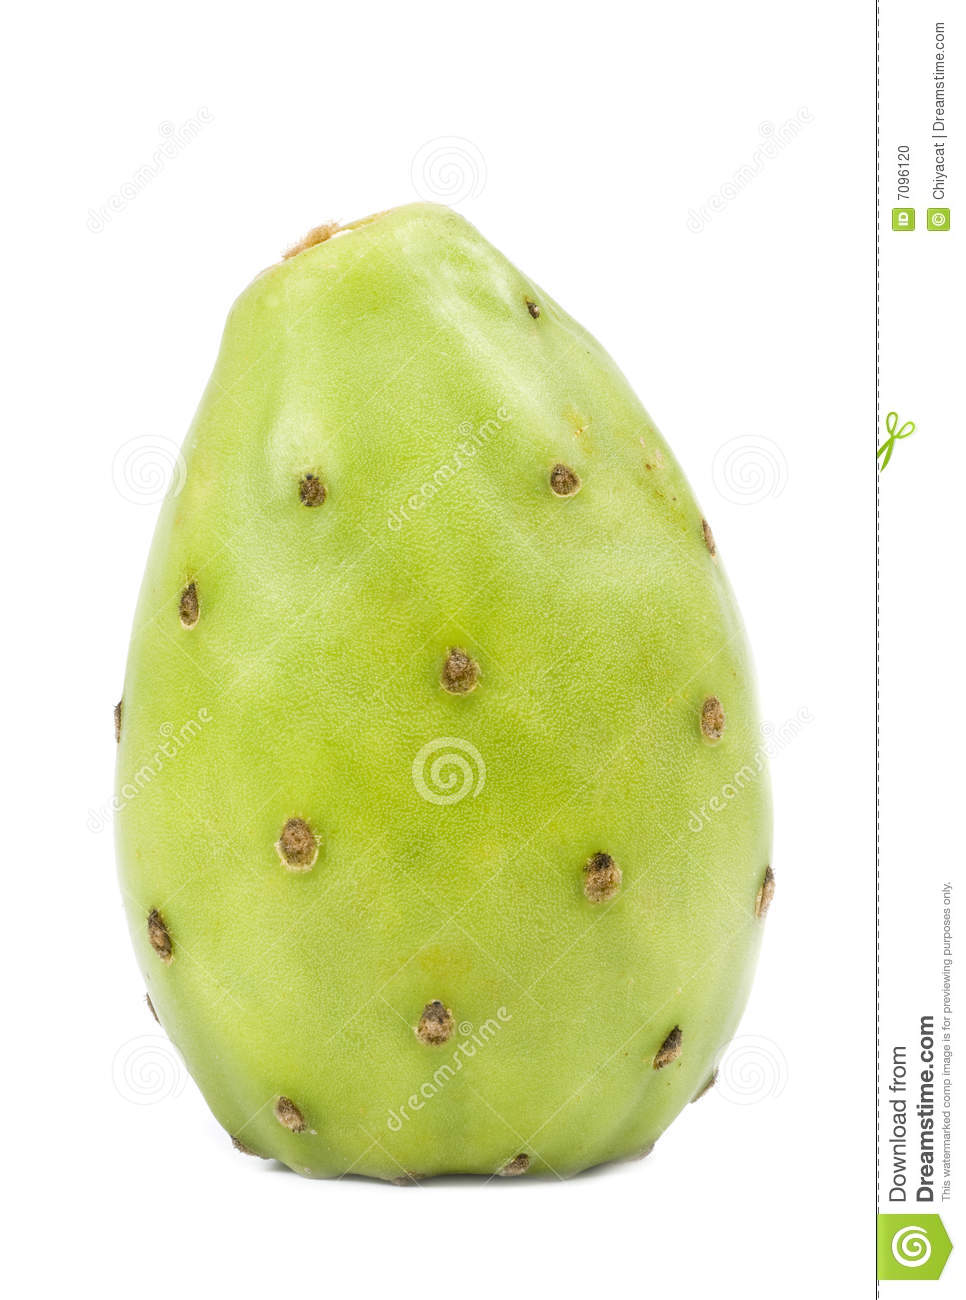 Green Cactus Pear Stock Photo.